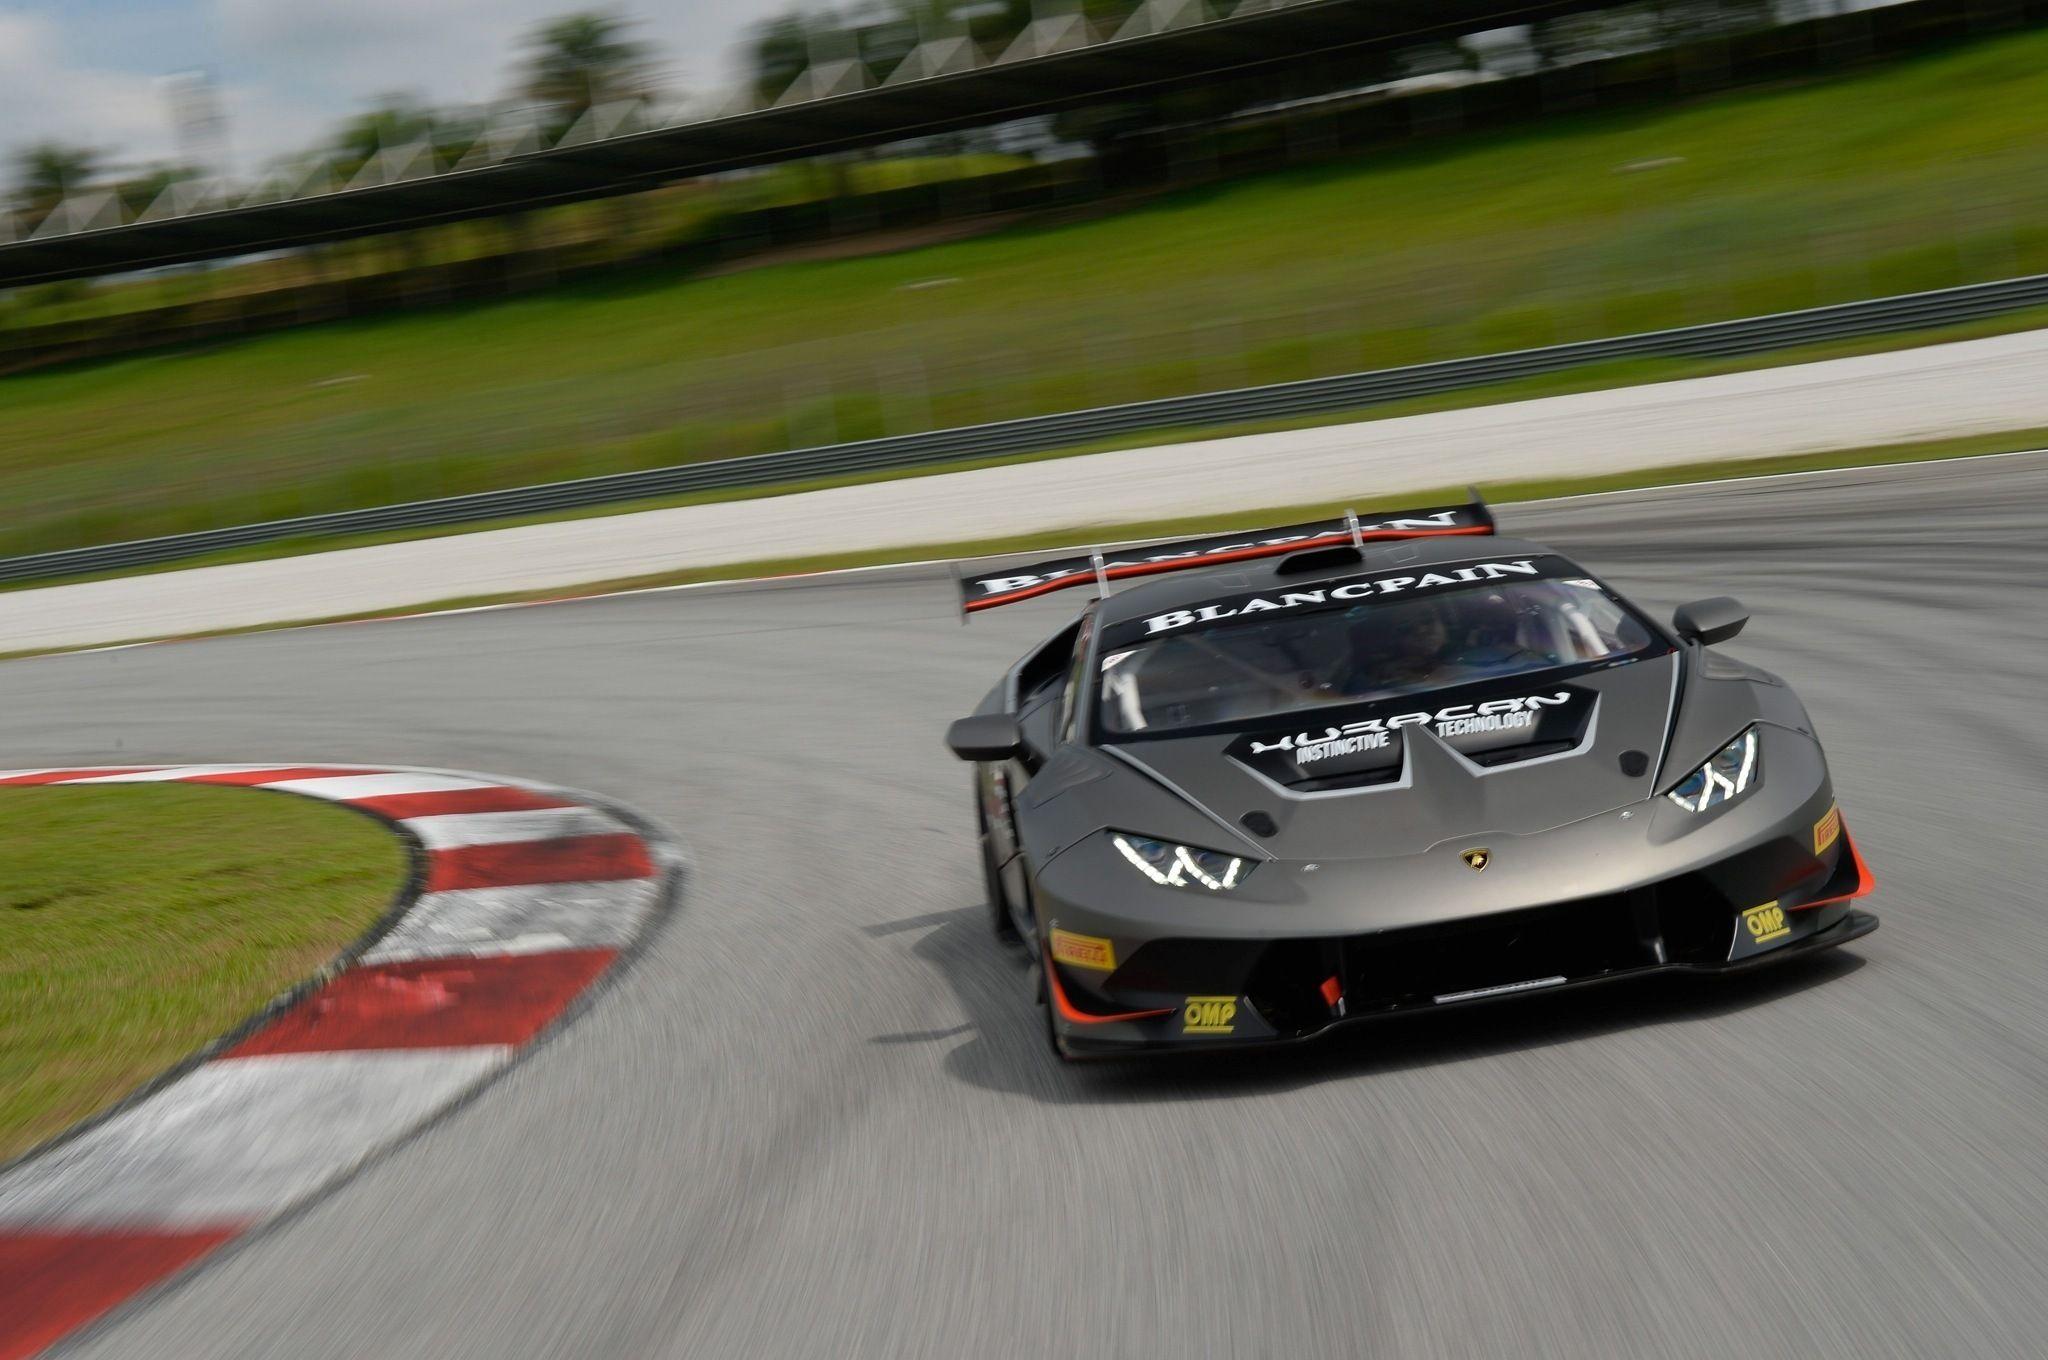 6c1826671dea8cf355c4deefa5e78ddf Gorgeous Lamborghini Huracan Lp620-2 Super Trofeo top Speed Cars Trend